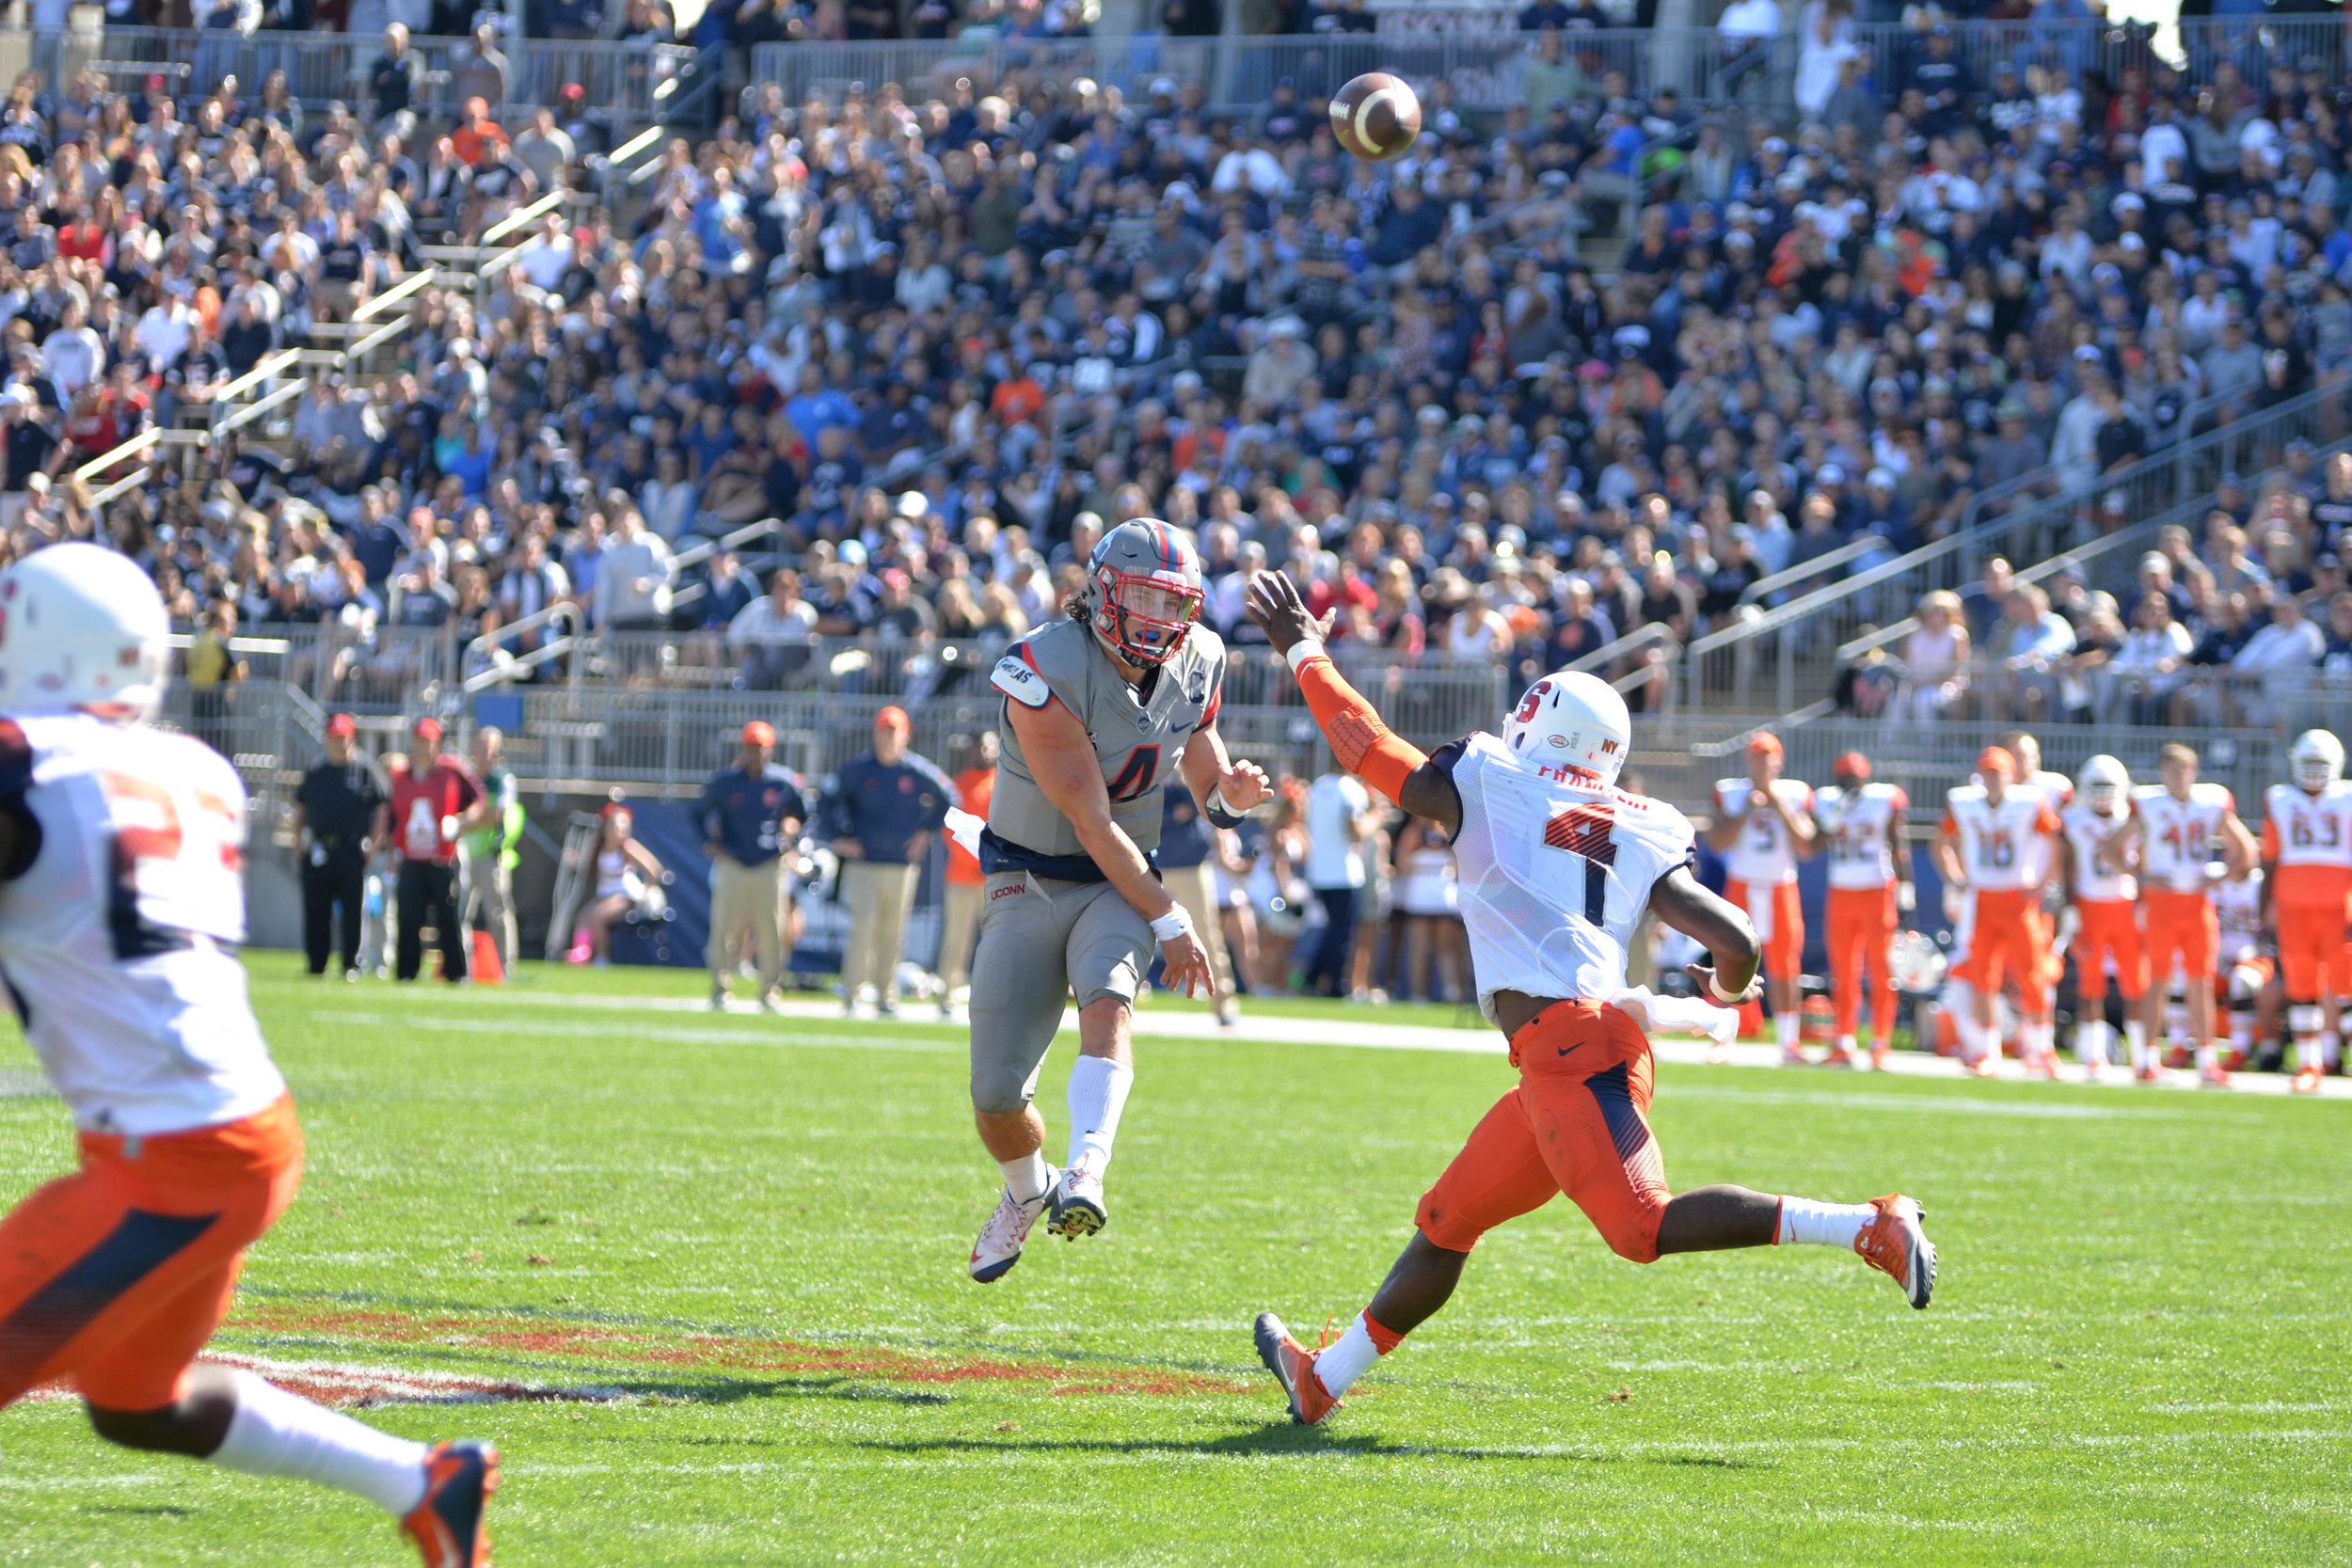 Bryan Shirreffs throws a pass during UConn's game against Syracuse. (Jackson Haggis/The Daily Campus)